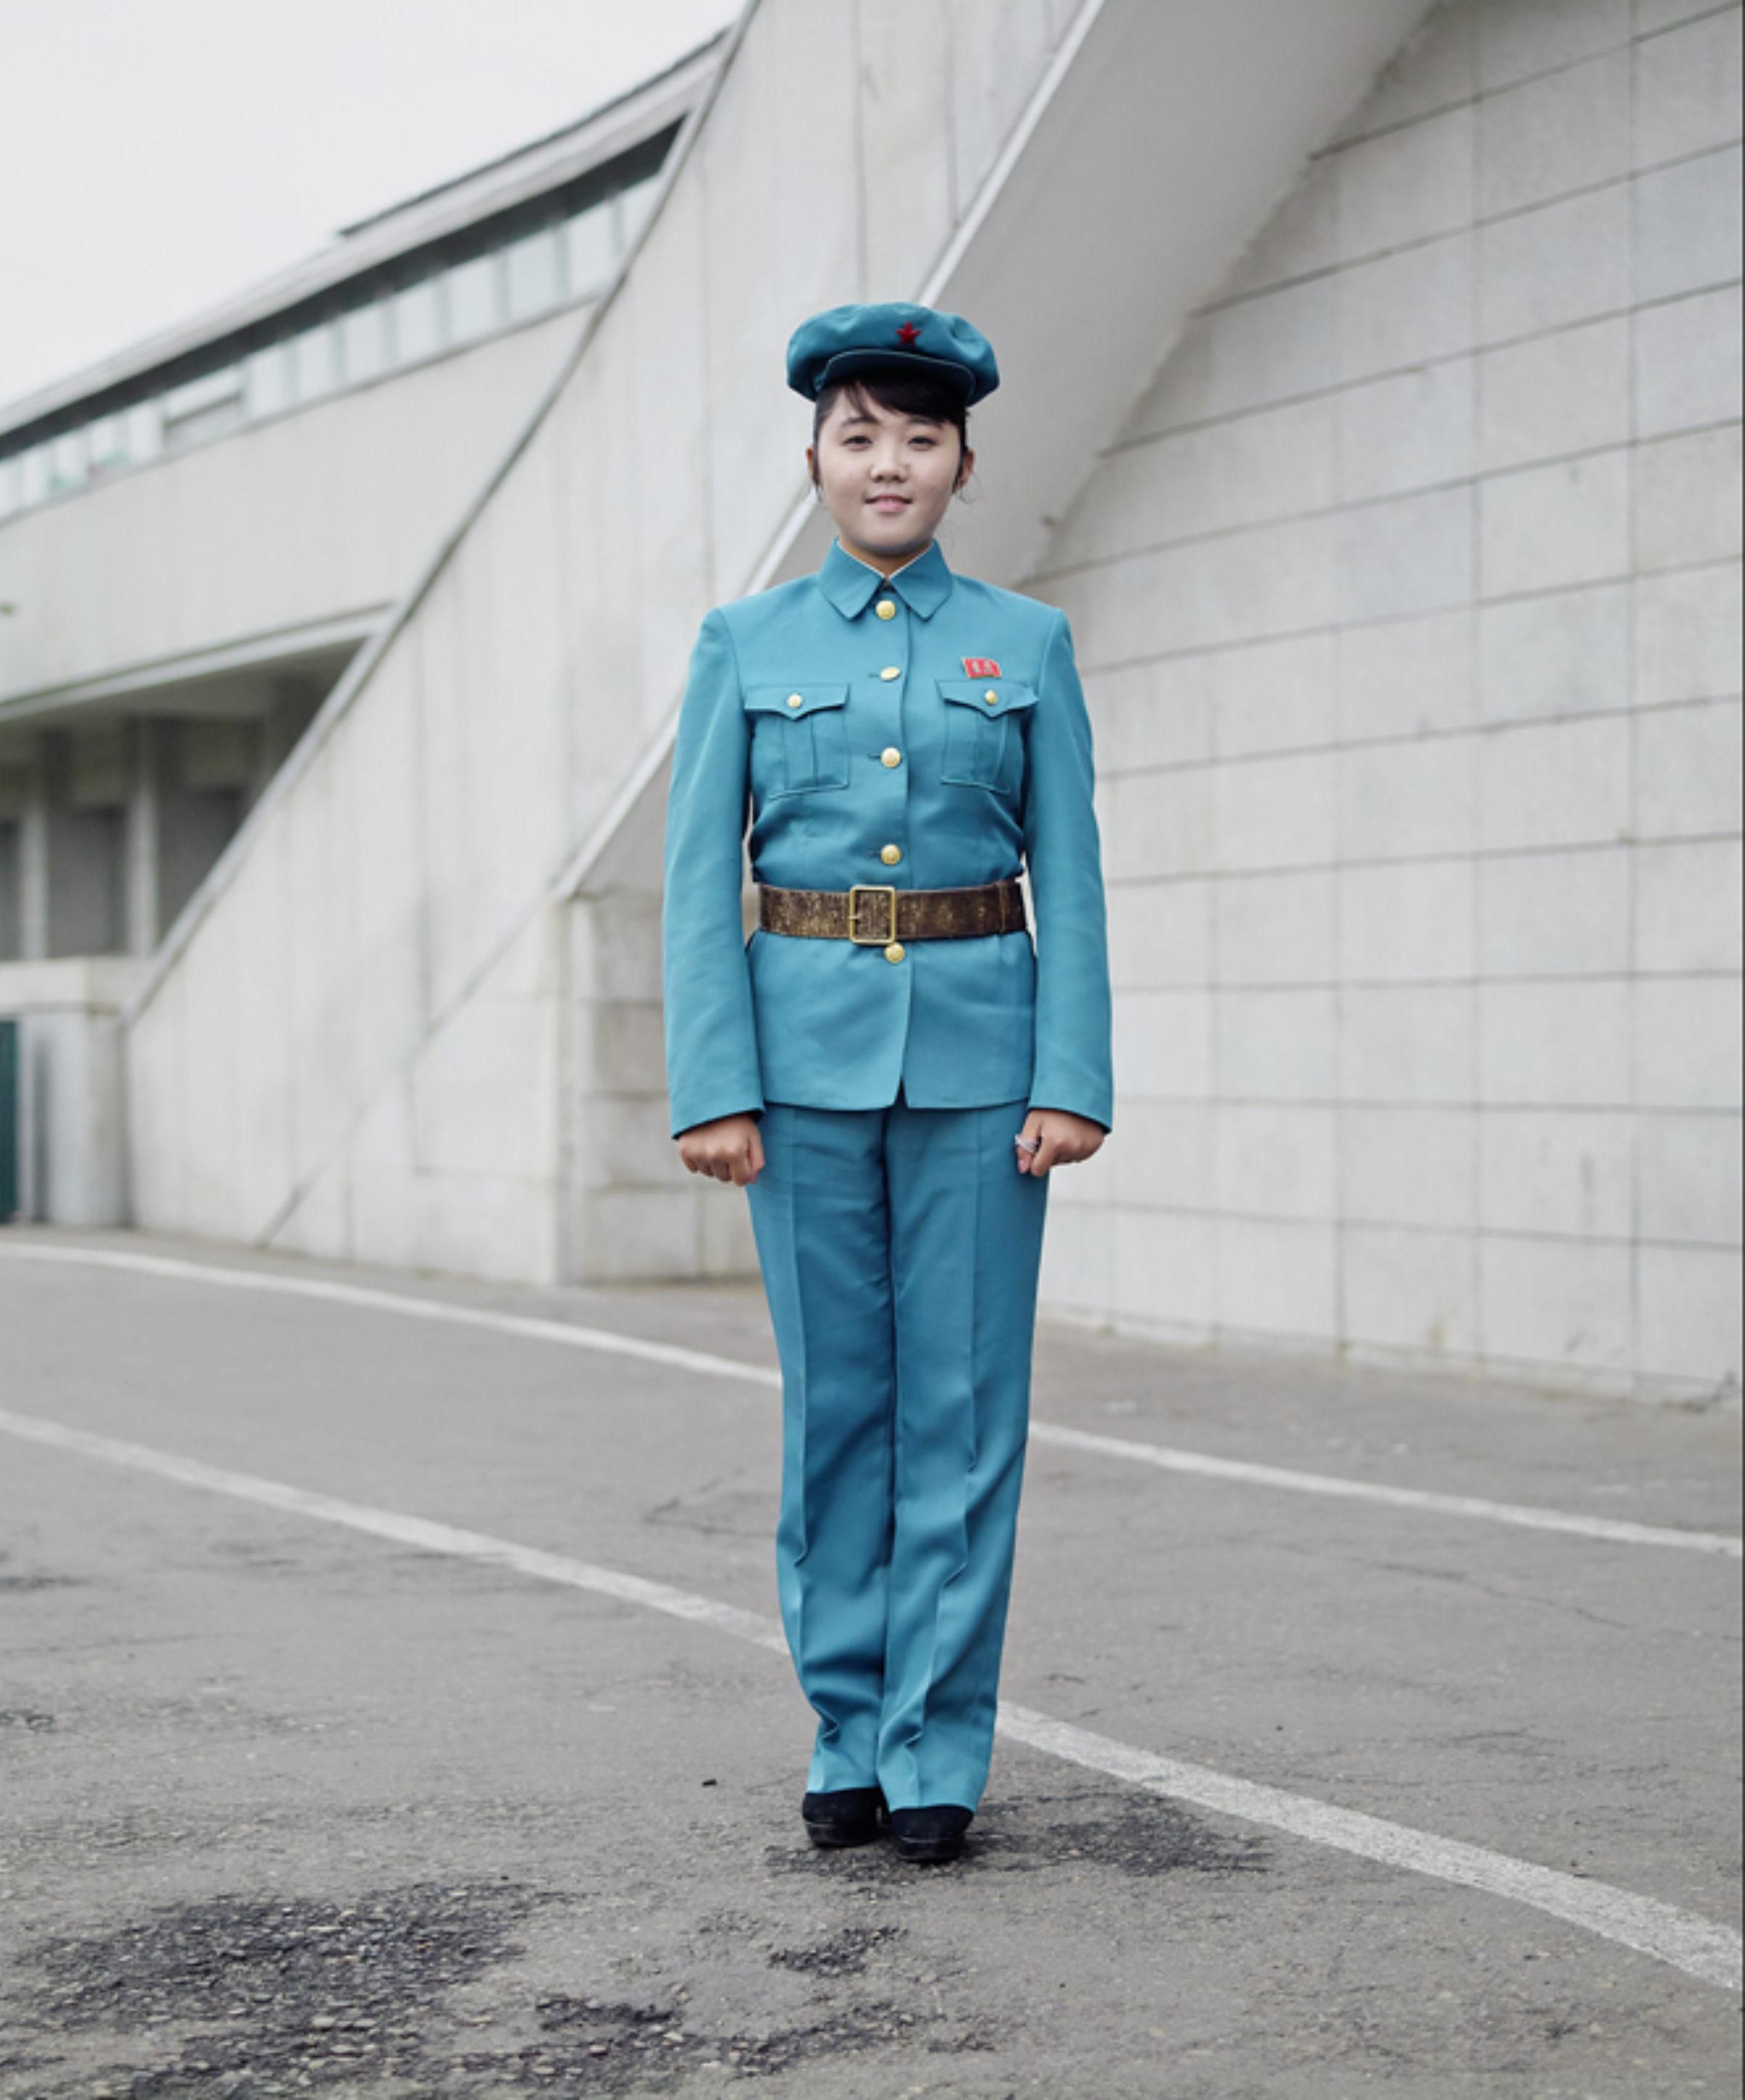 Guard in Blue Eddo Hartmann 35hxocejk9